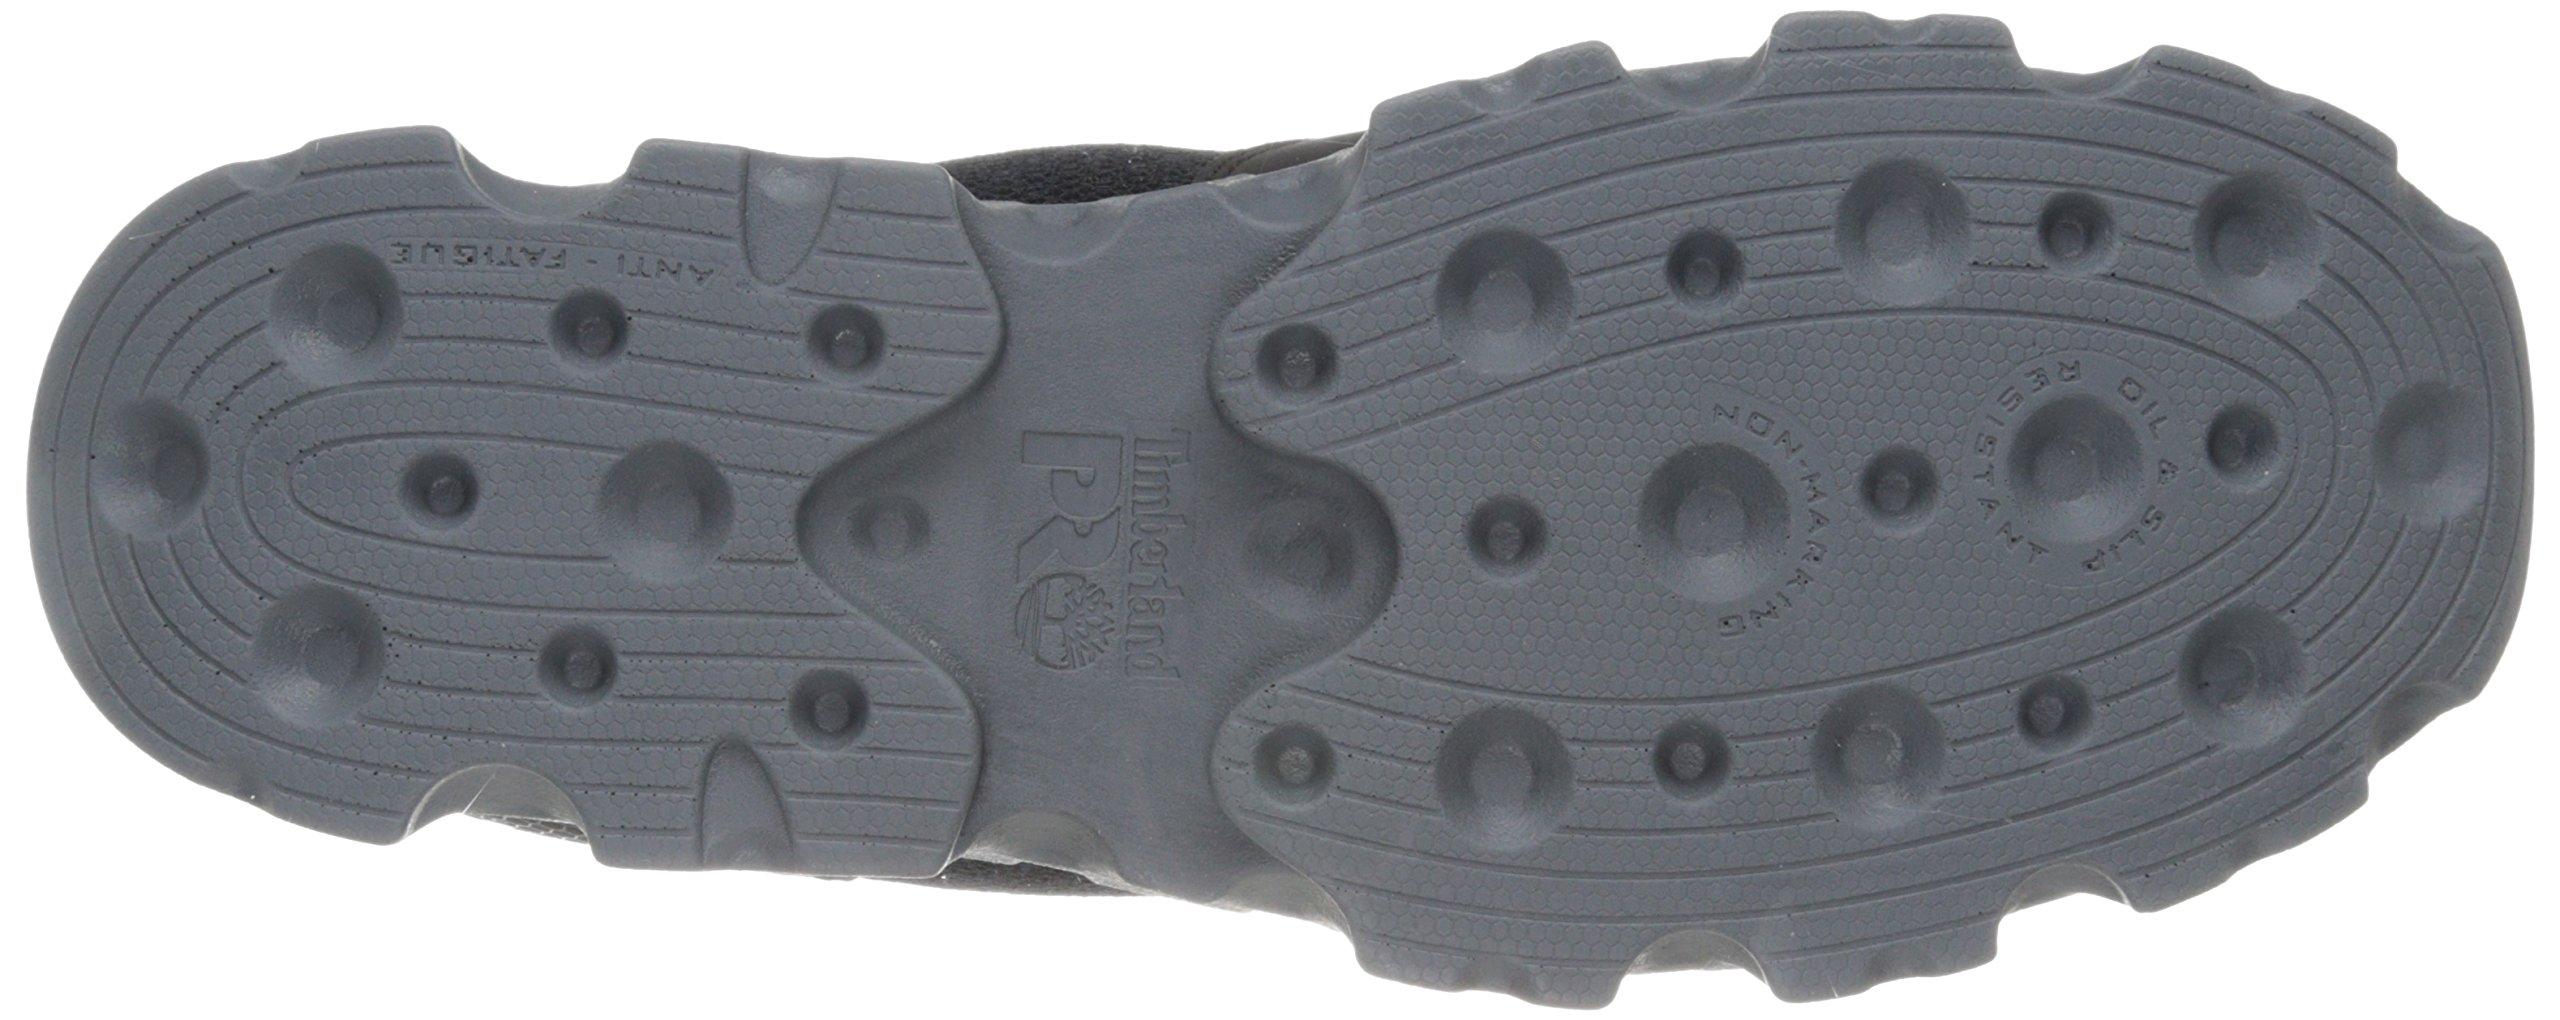 Timberland PRO Men's Powertrain Alloy-Toe Electro Static Dissipative Industrial Shoe